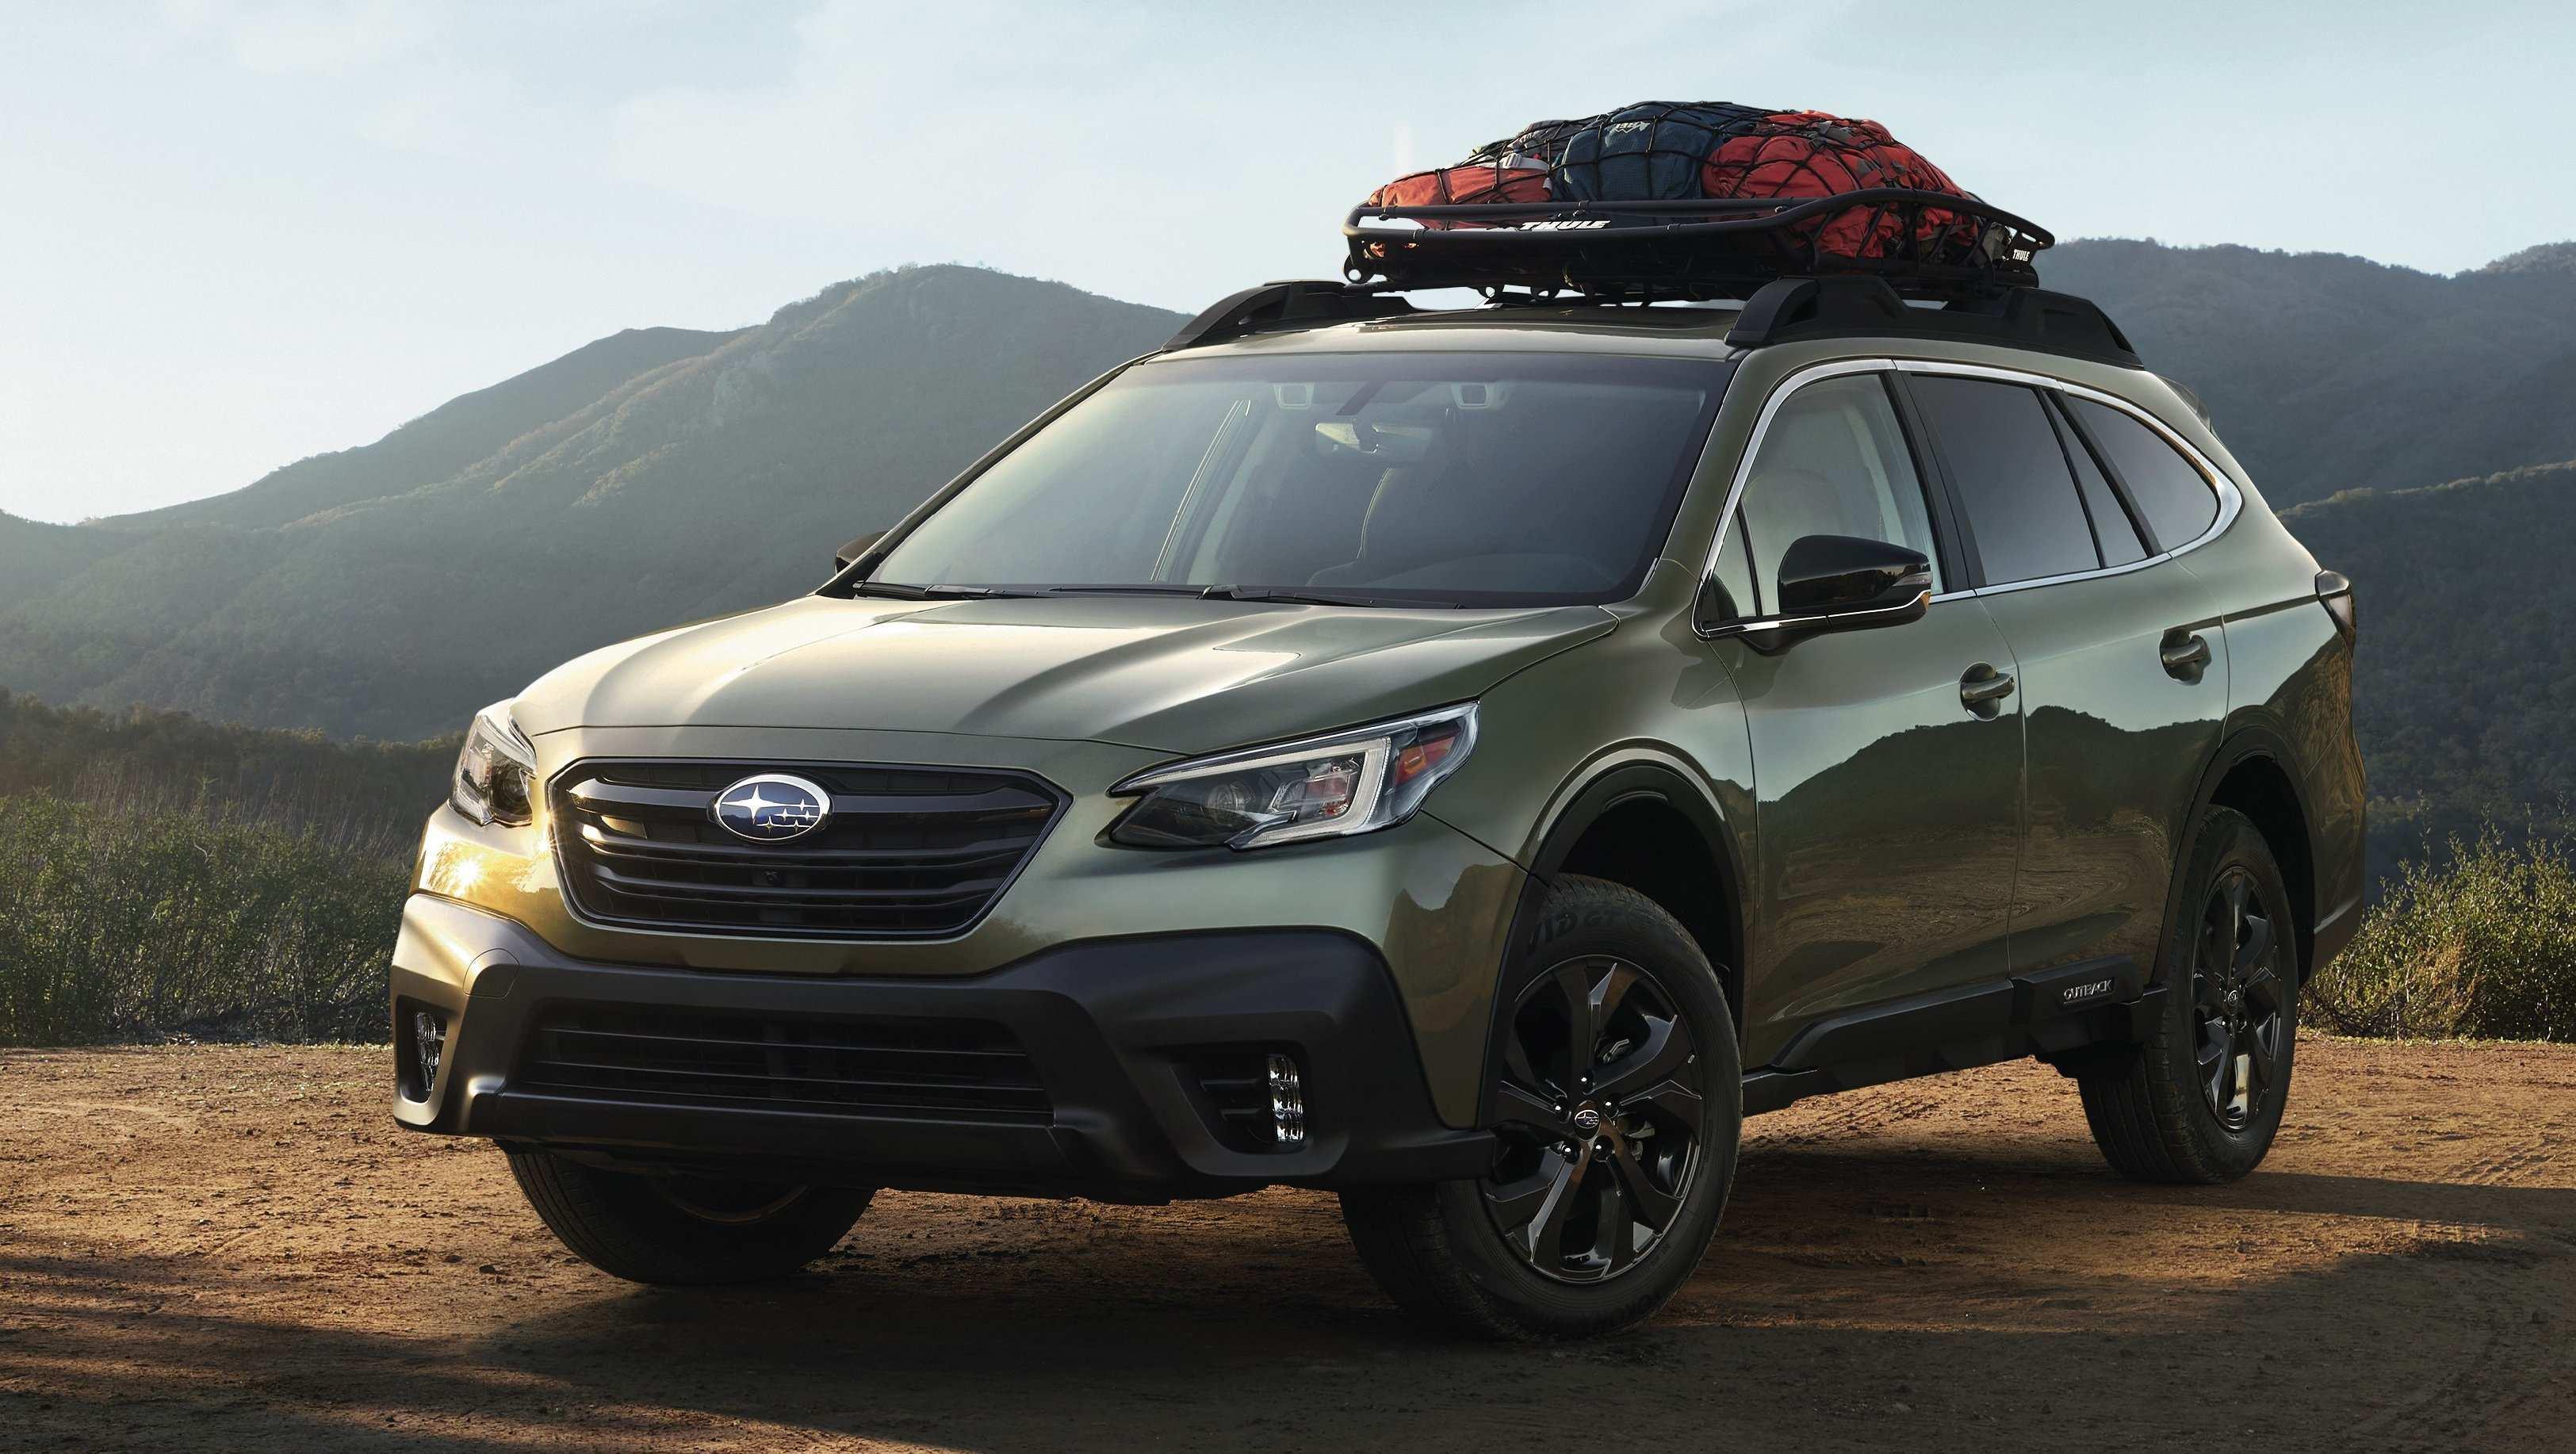 31 Great Subaru Outback 2020 Japan Rumors with Subaru Outback 2020 Japan